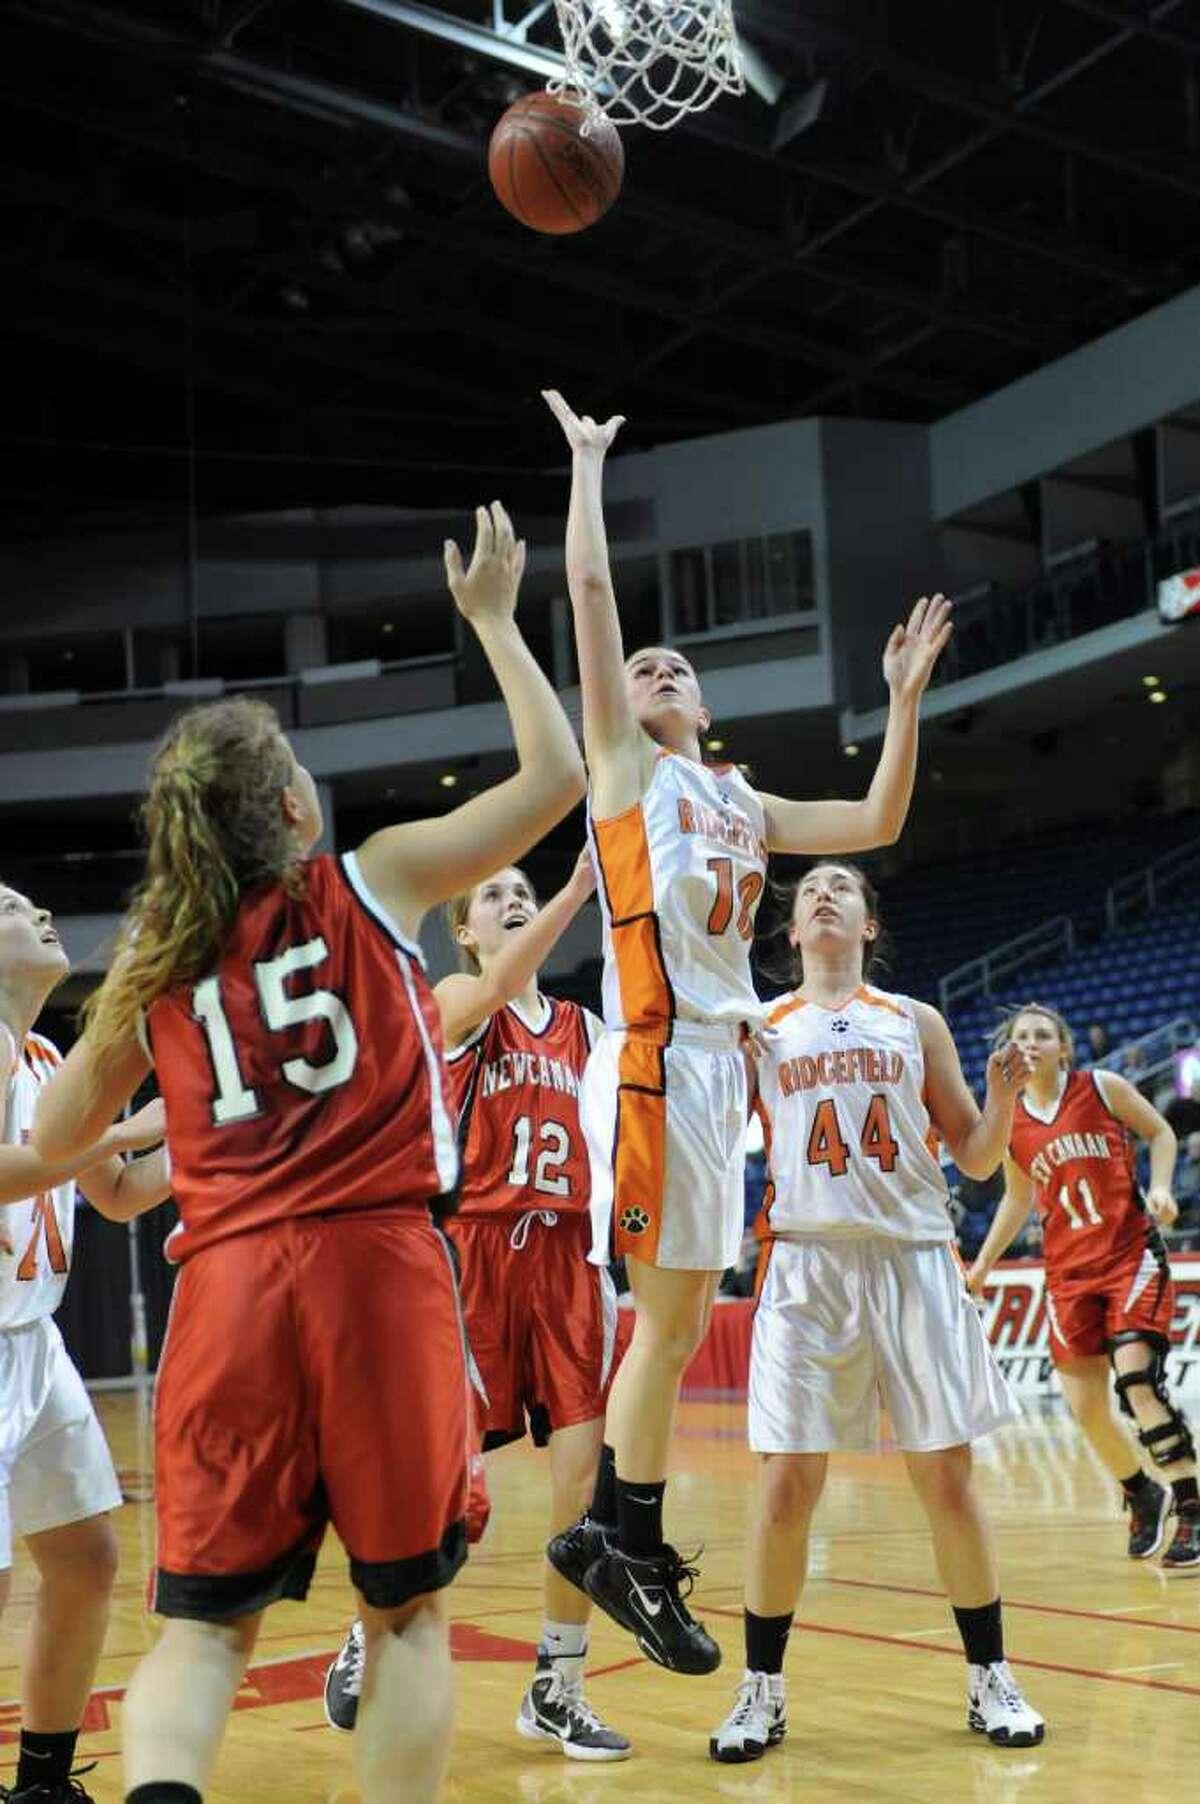 Ridgefield's Kathryn Cholko puts up a shot during Tuesday's FCIAC girls basketball semifinal game at the Webster Bank Arena at Harbor Yard on Feburary 22, 2011.